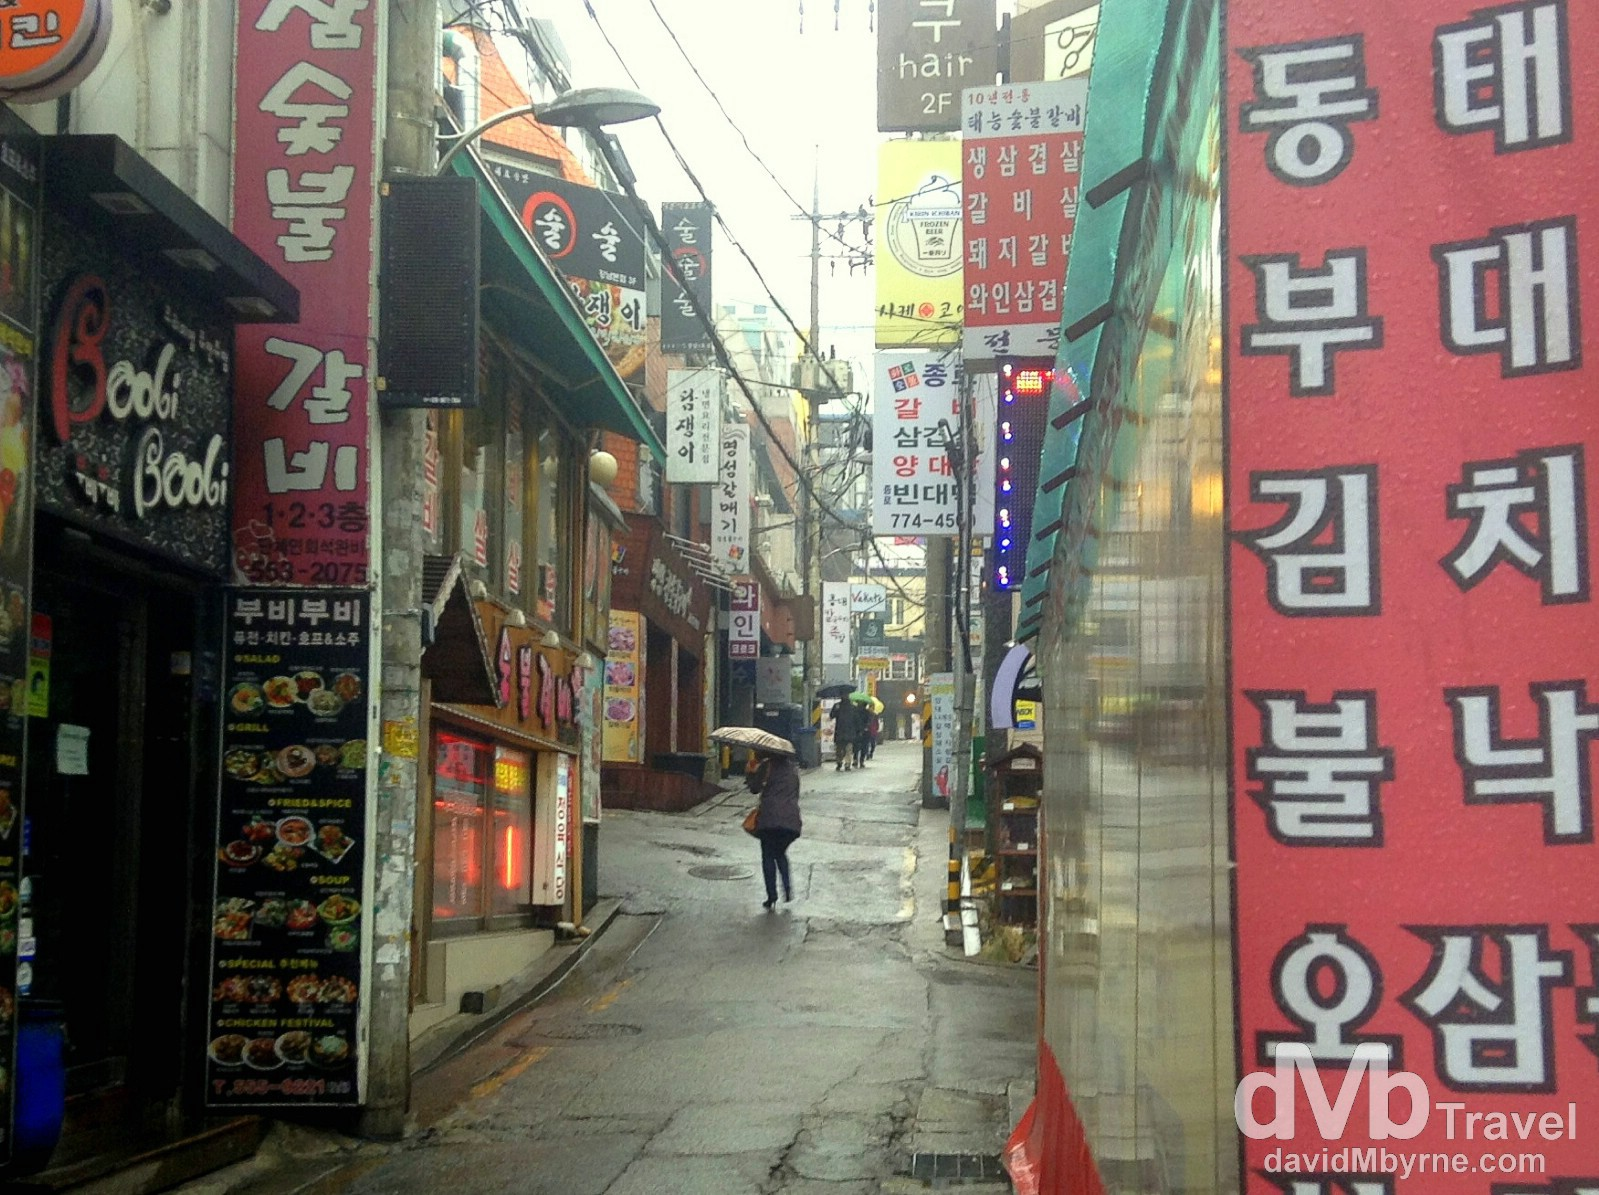 Hangul, the Korean alphabet, in the lanes of Gangnam, Seoul, South Korea. January 25th 2014.